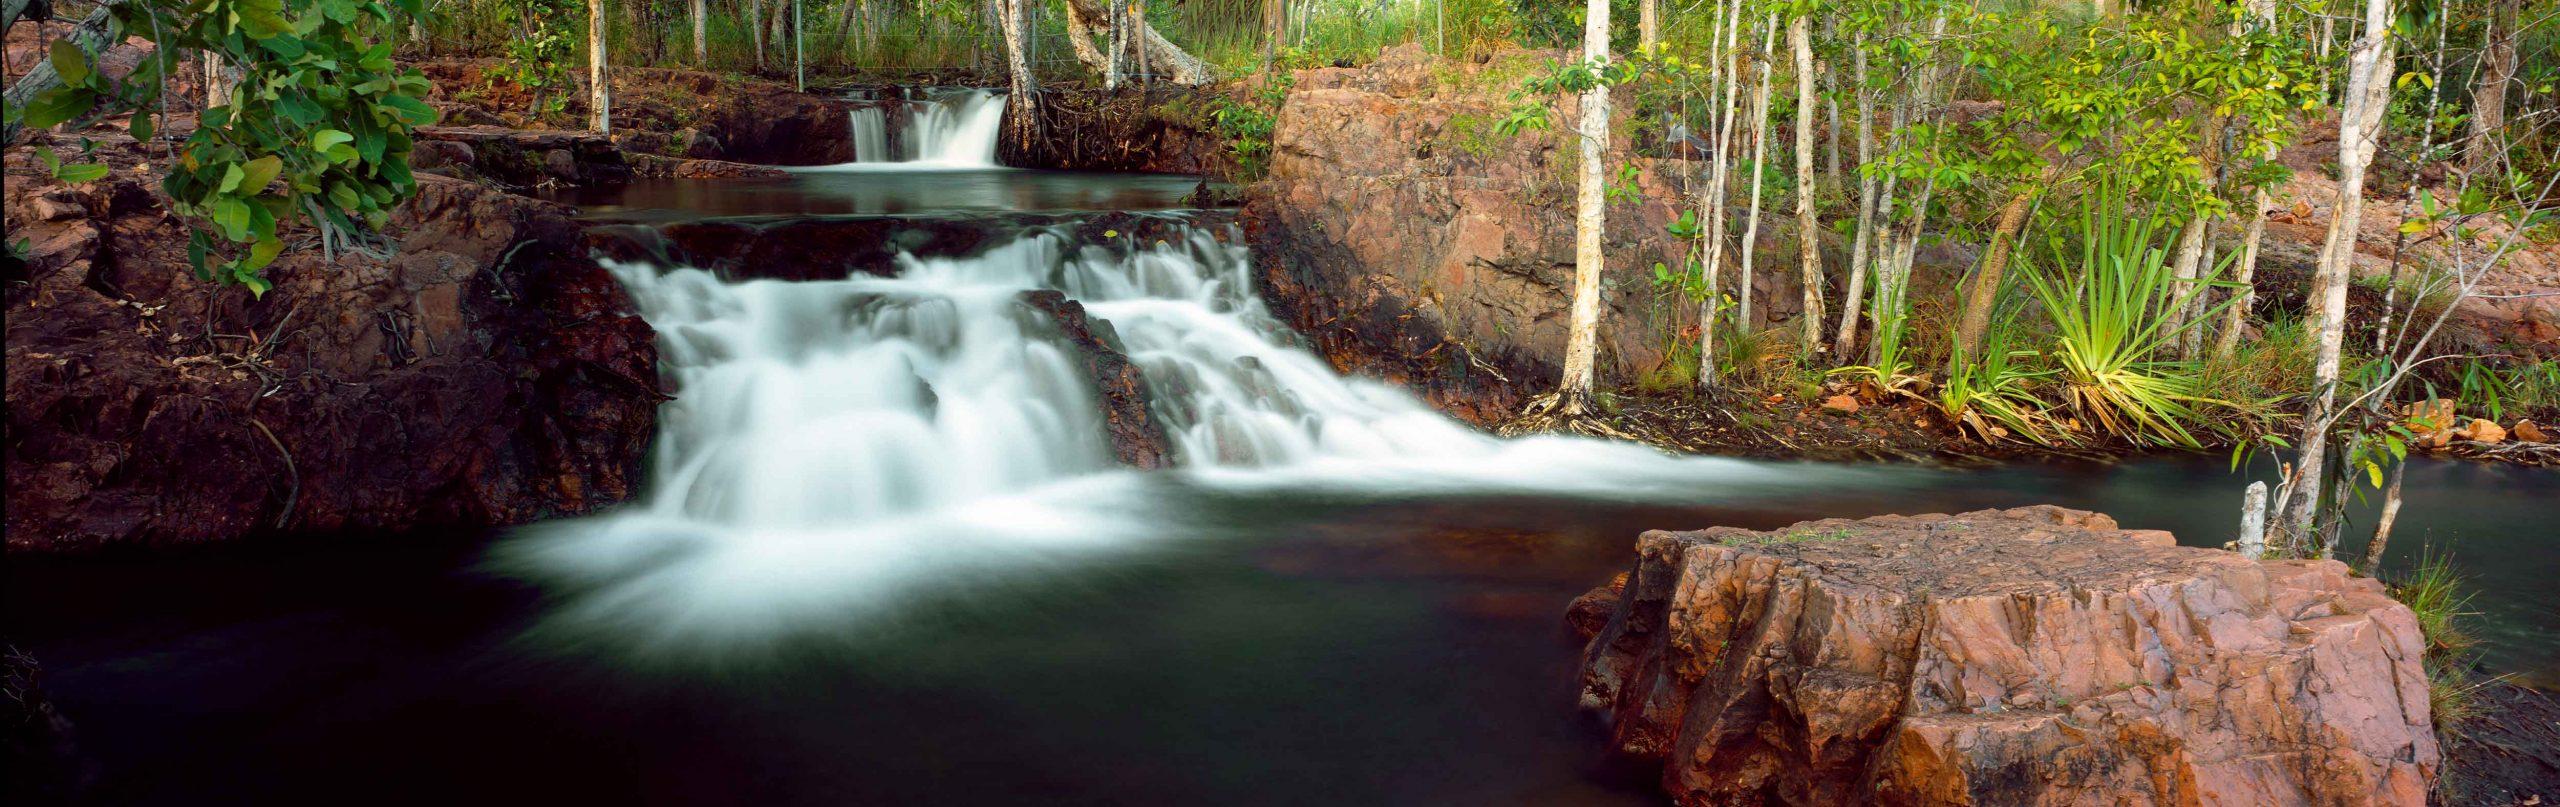 Buley Rockhole Litchfield national Park, Northern Territory